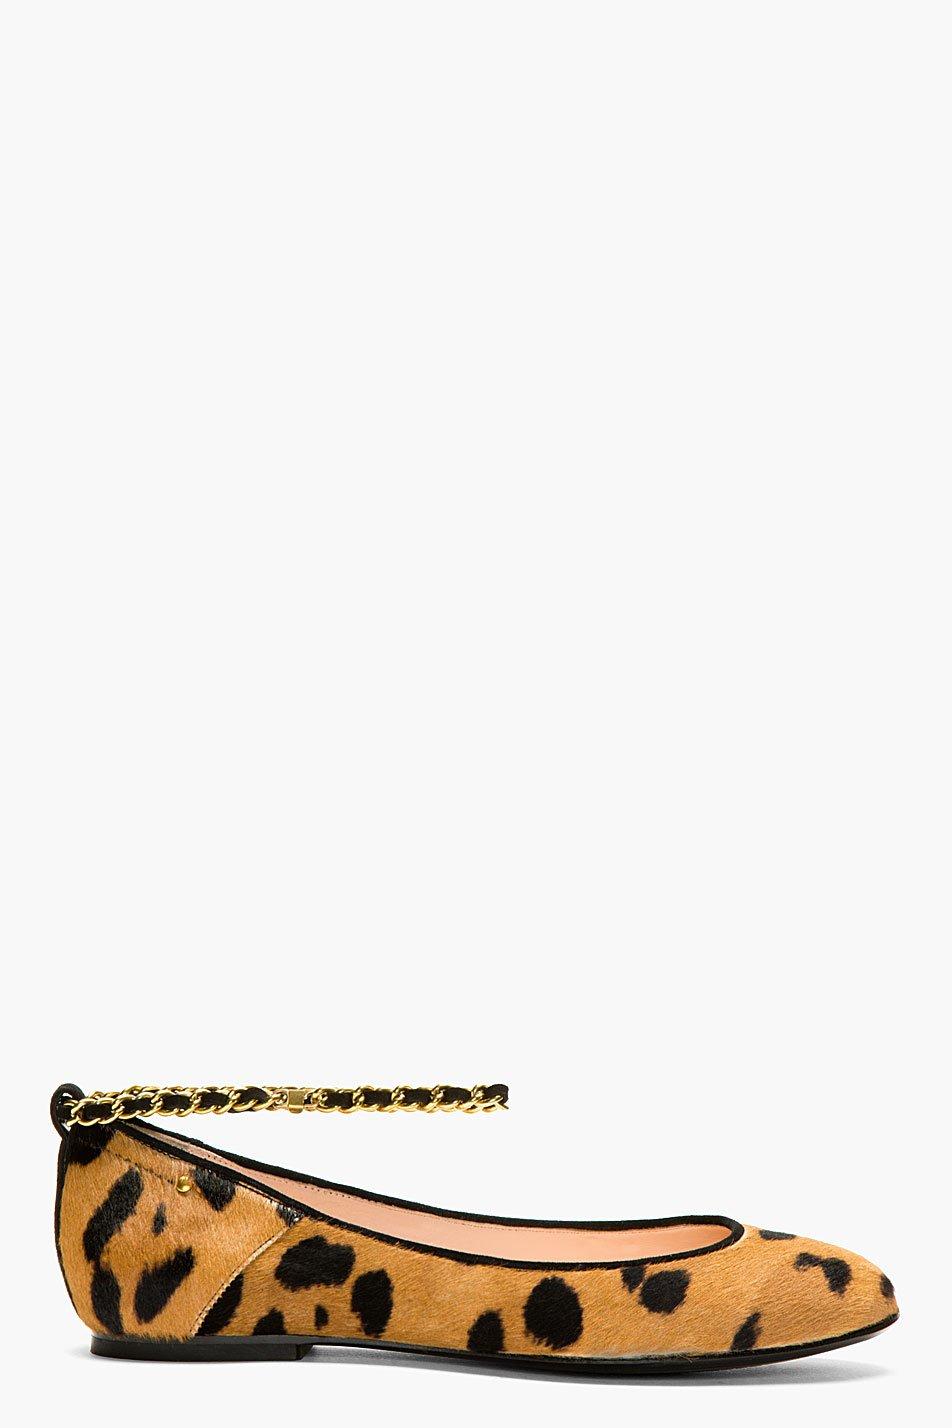 Jrme dreyfuss brown leopard print calf hair aurelie ballerina flat